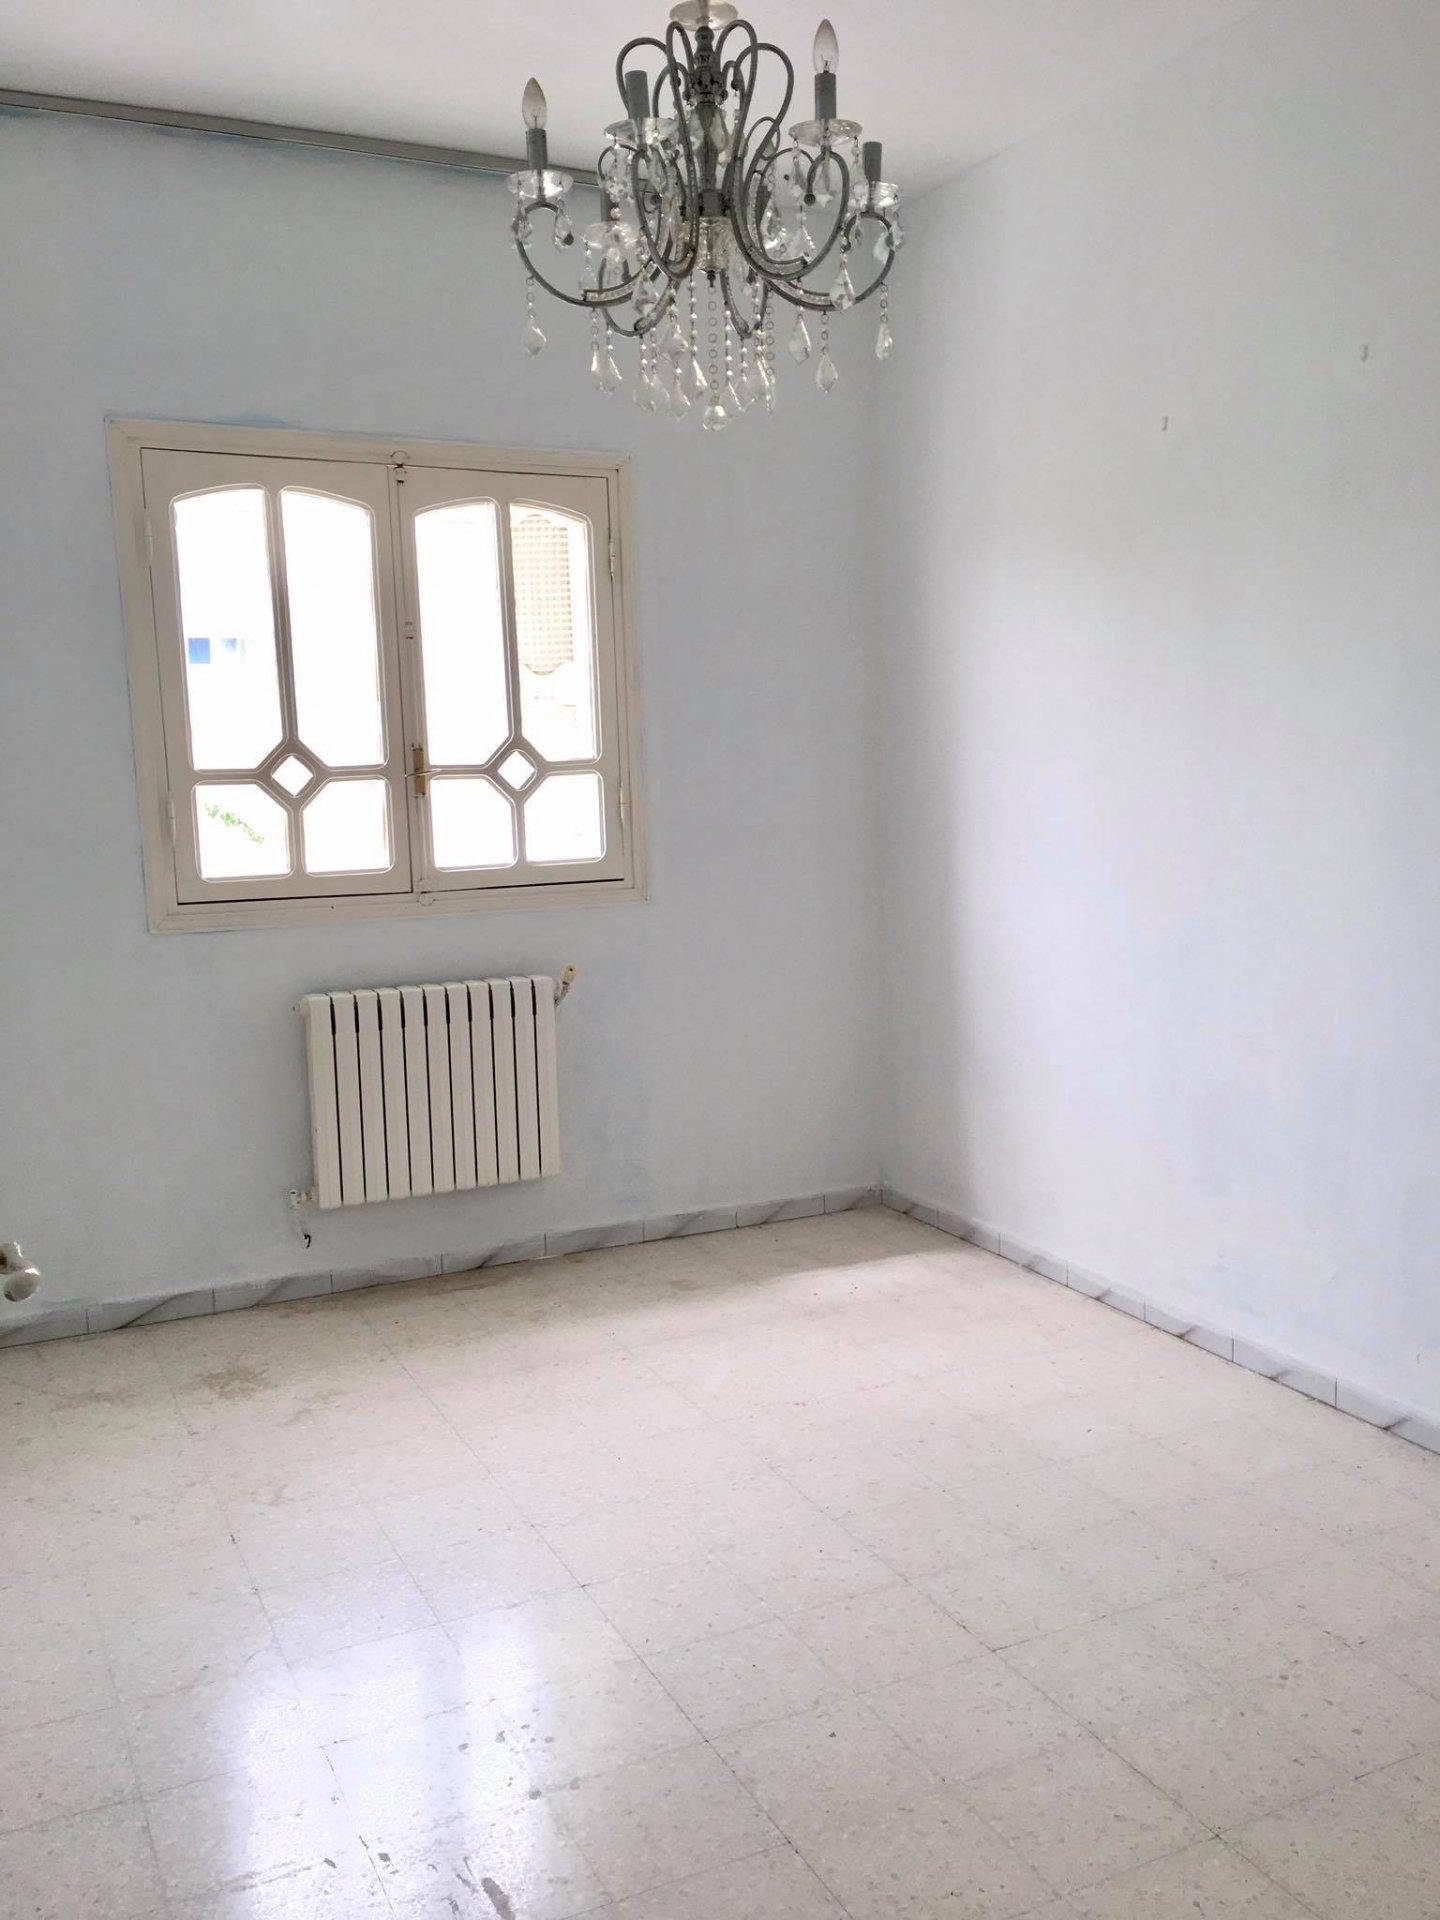 Location Etage de villa bureautique S+3 de 130m² a La Marsa.